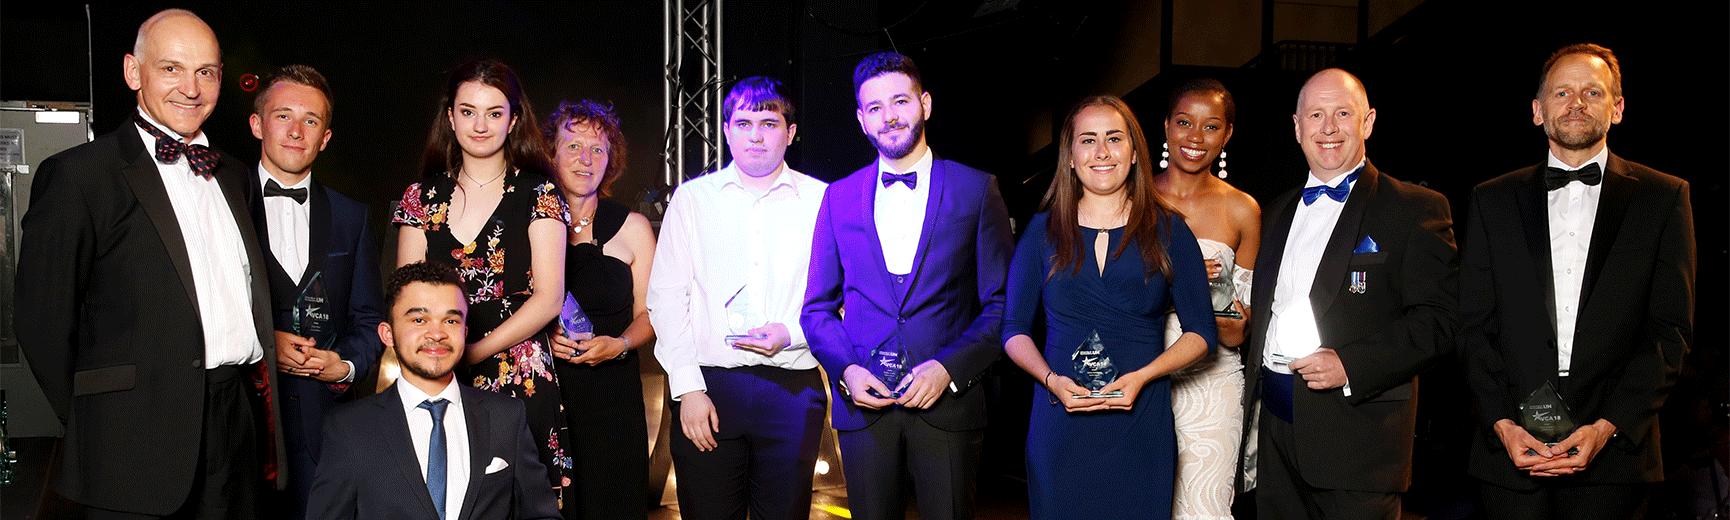 VCA Student Award Winners